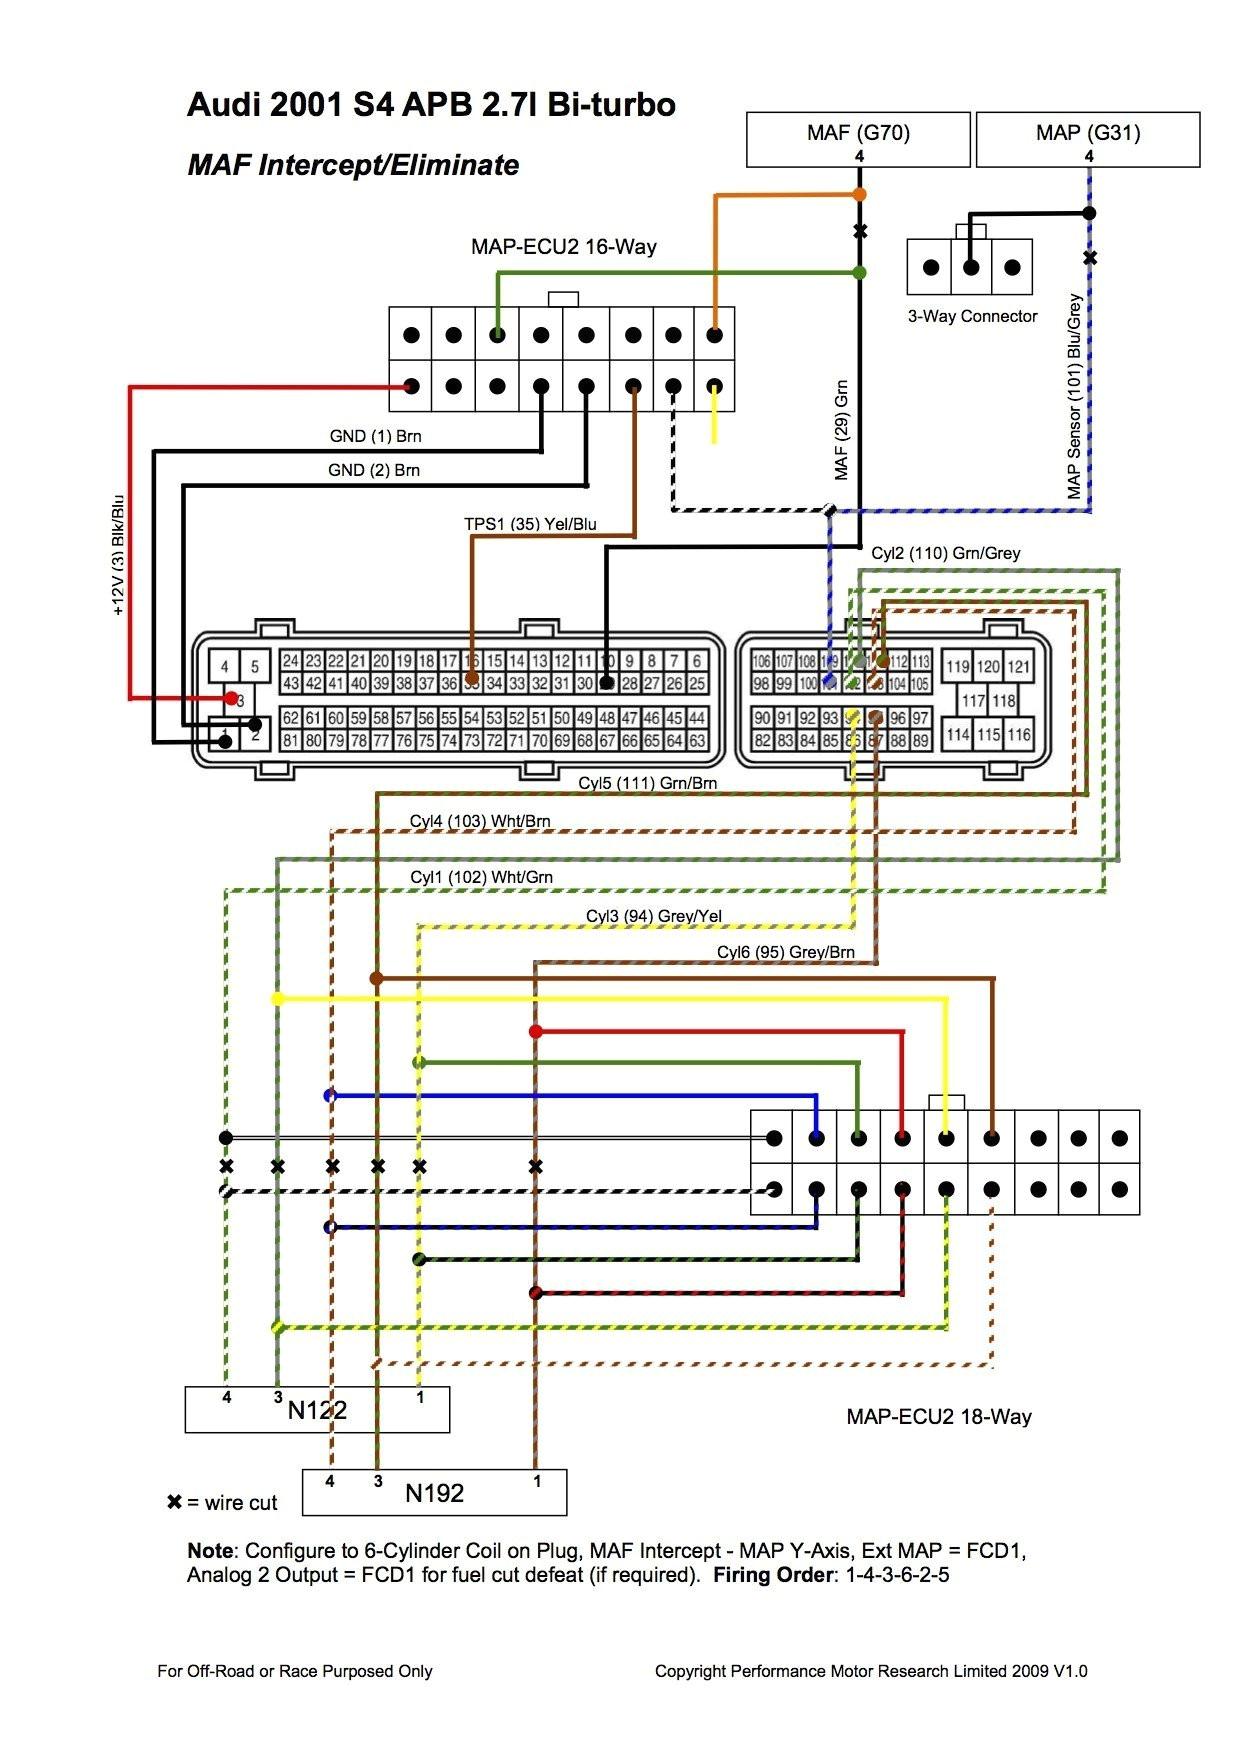 2009 dodge radio wiring harness wiring diagrams konsult 2009 dodge ram 1500 headlight wiring harness 2009 dodge ram 1500 wiring harness